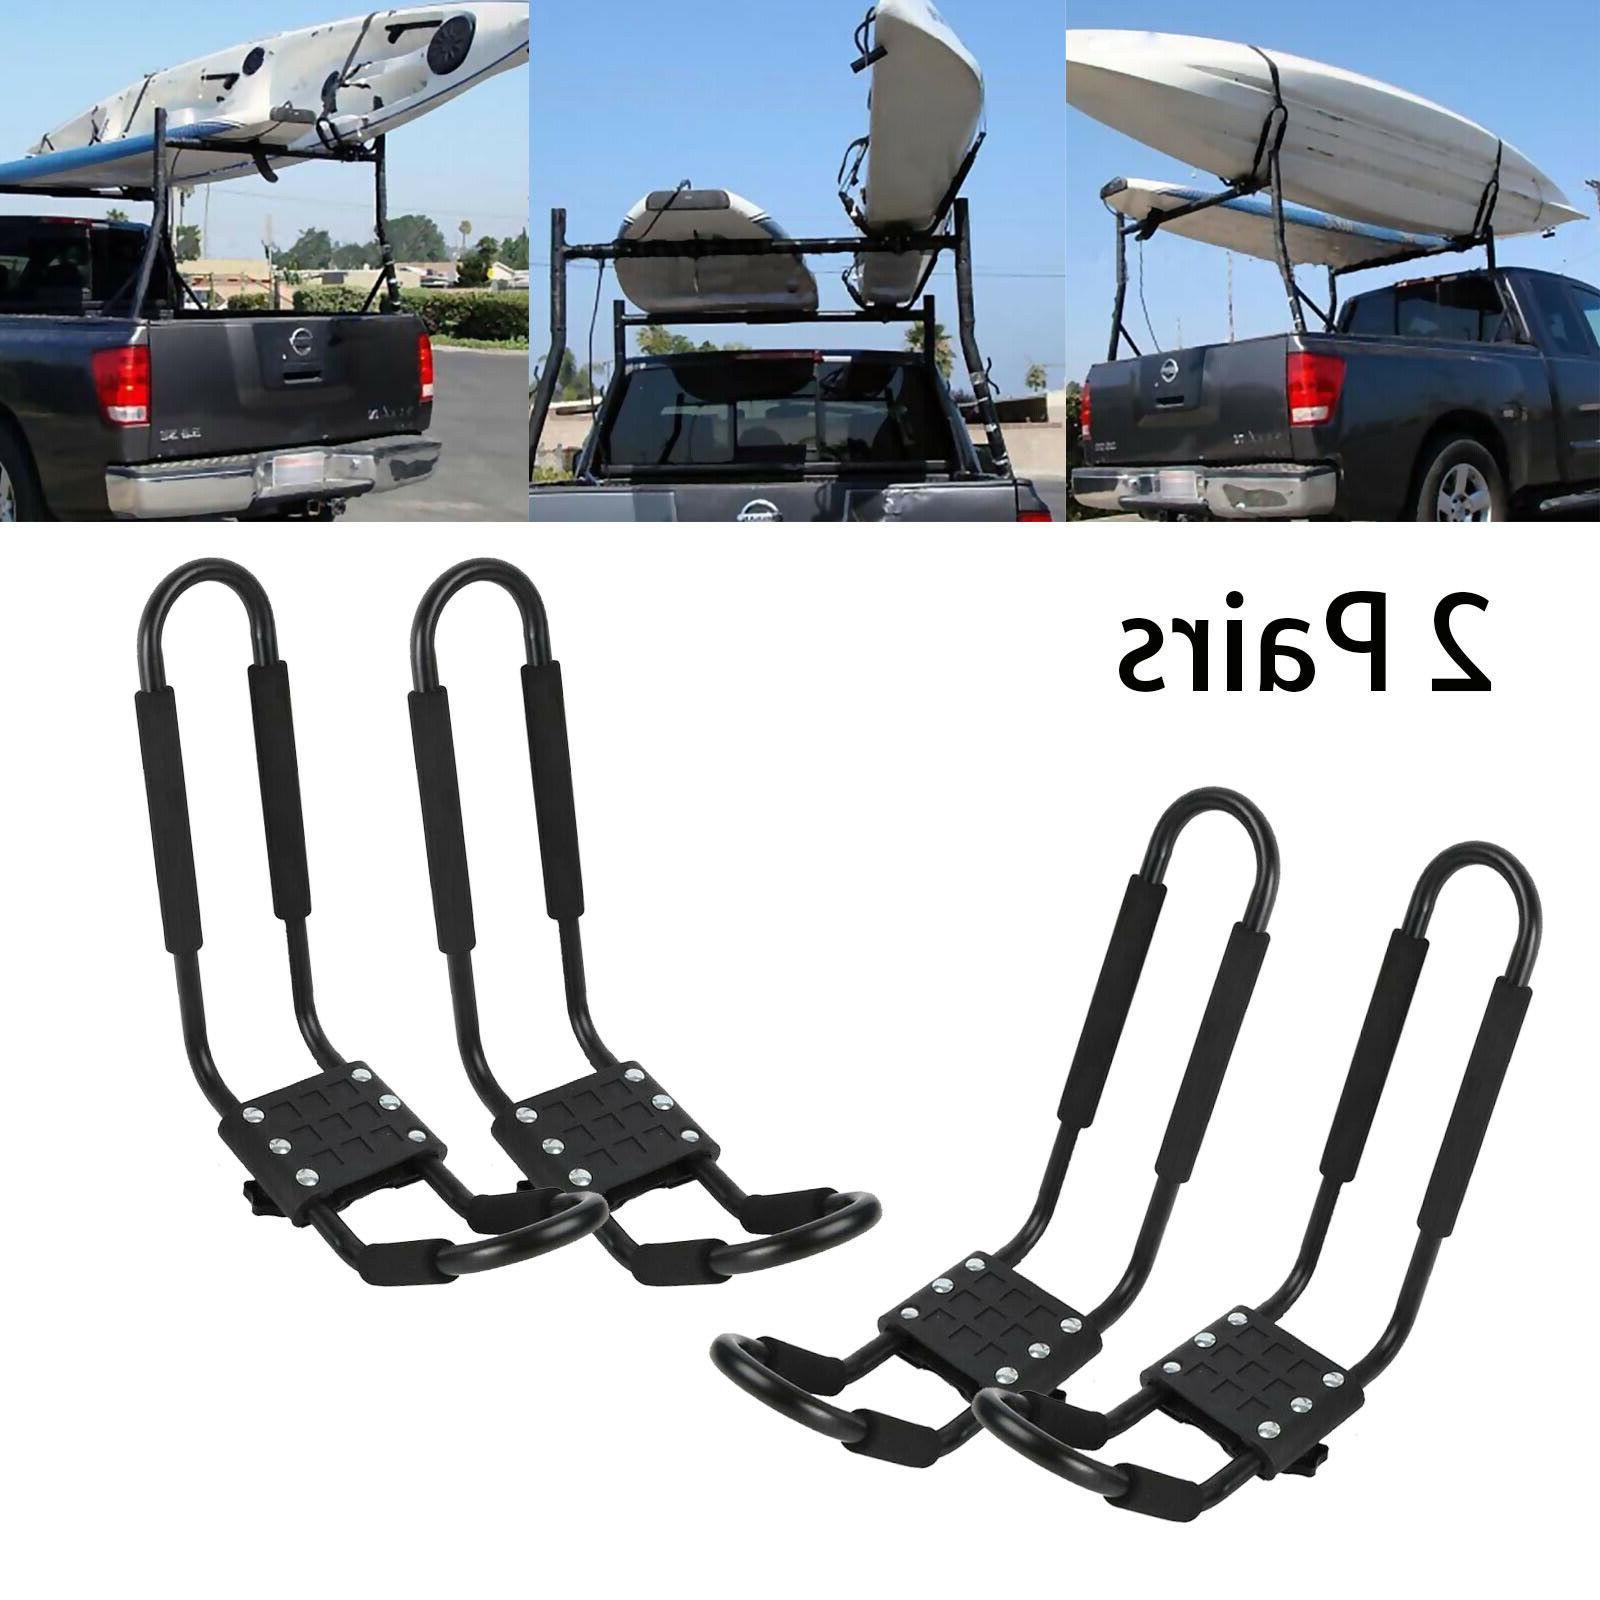 2 pairs canoe boat kayak roof rack